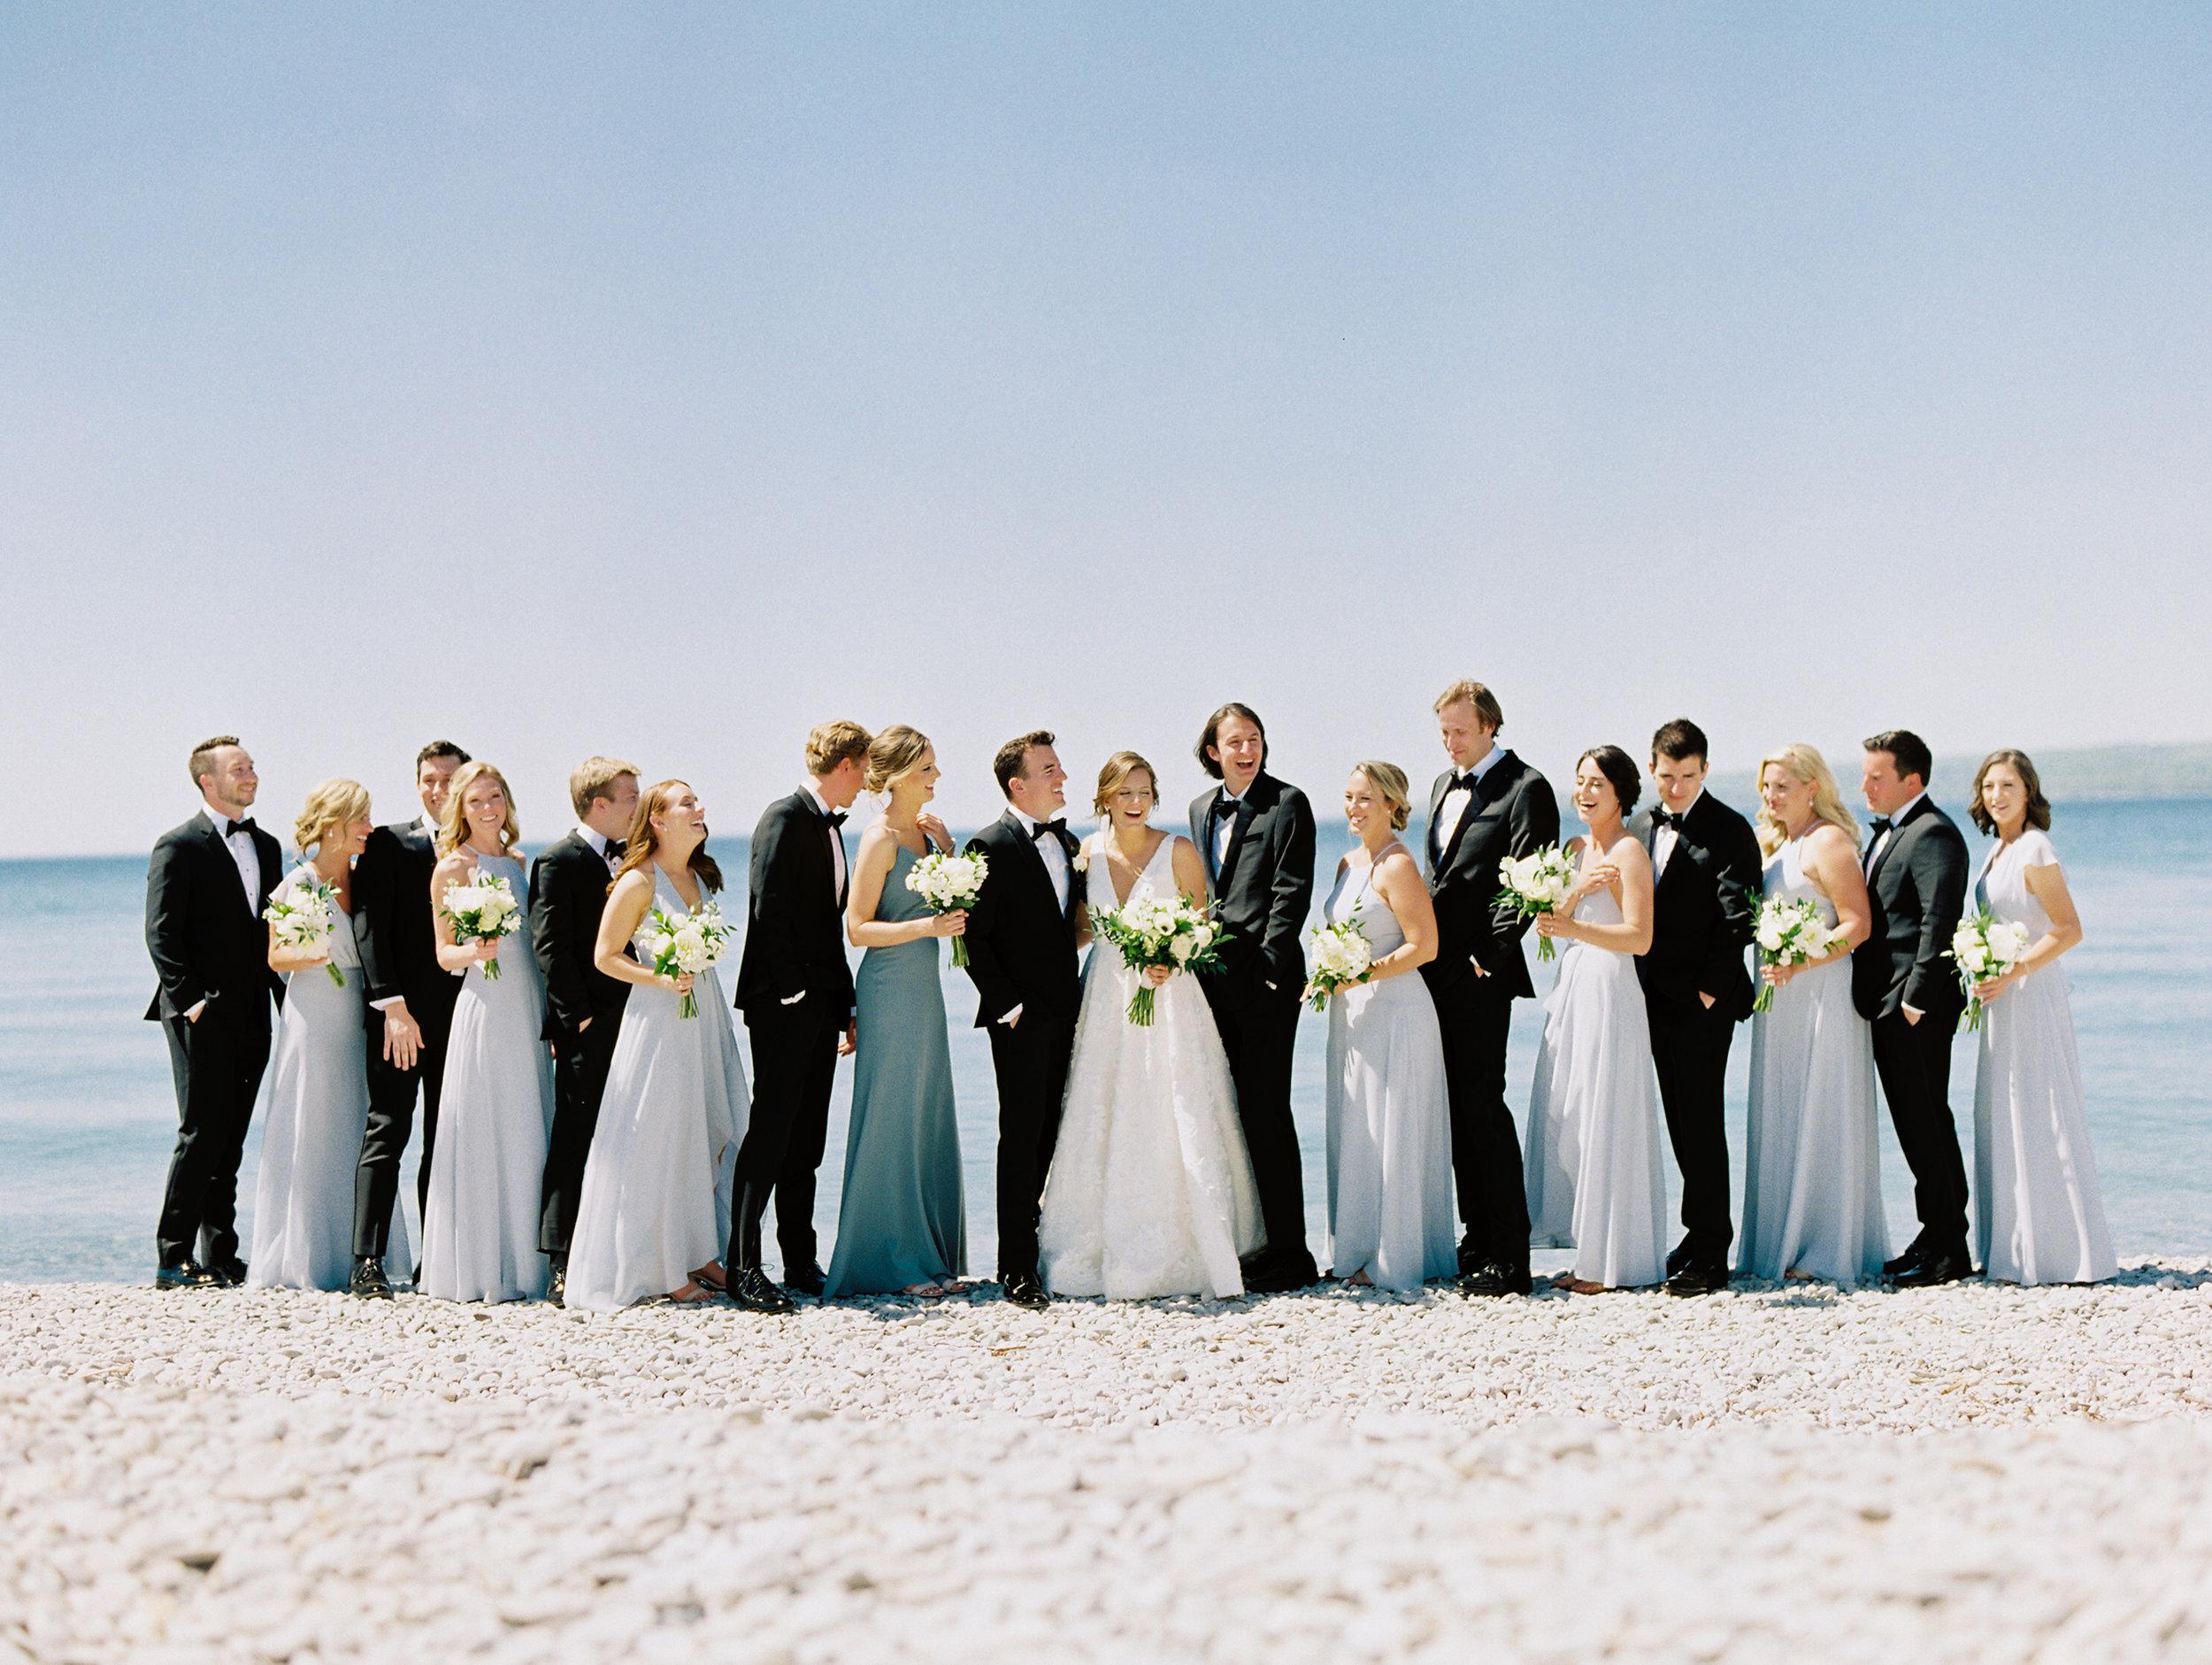 DeGuilio+Wedding+Bridal+Partyf-24.jpg